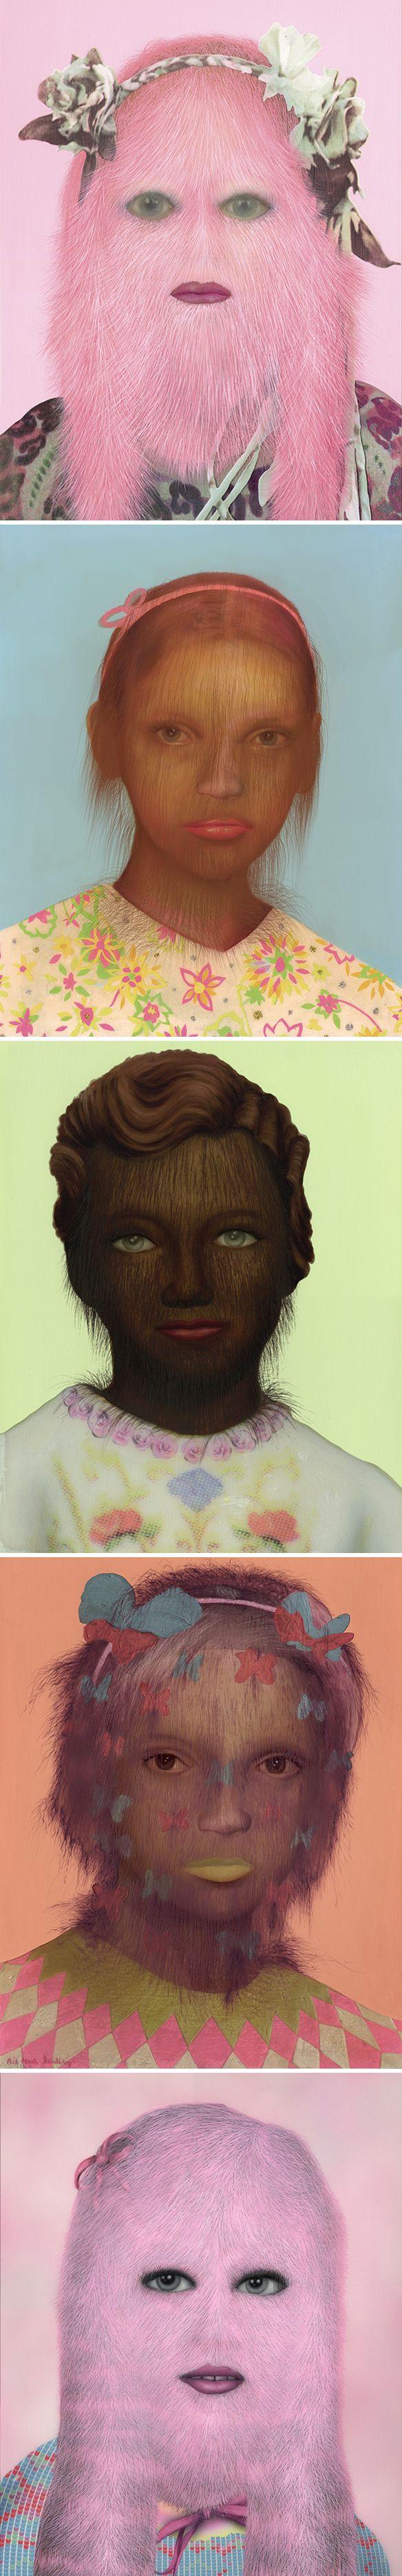 The Jealous Curator /// curated contemporary art /// erik mark sandberg